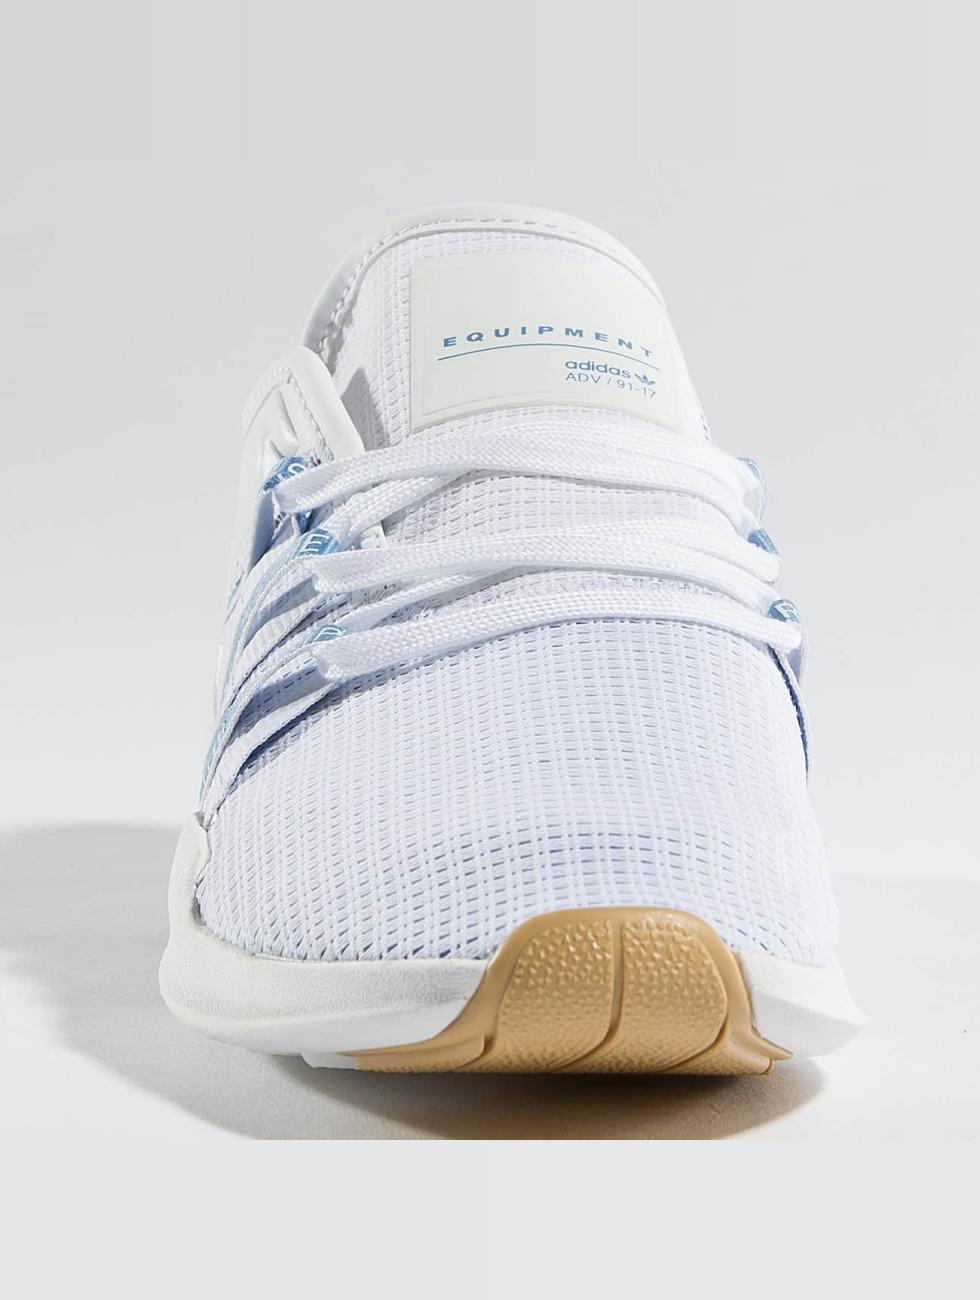 Adidas Originals Schoen / Sneaker Eqt Corsa Adv In Ingegno 437.545 rLSG8B